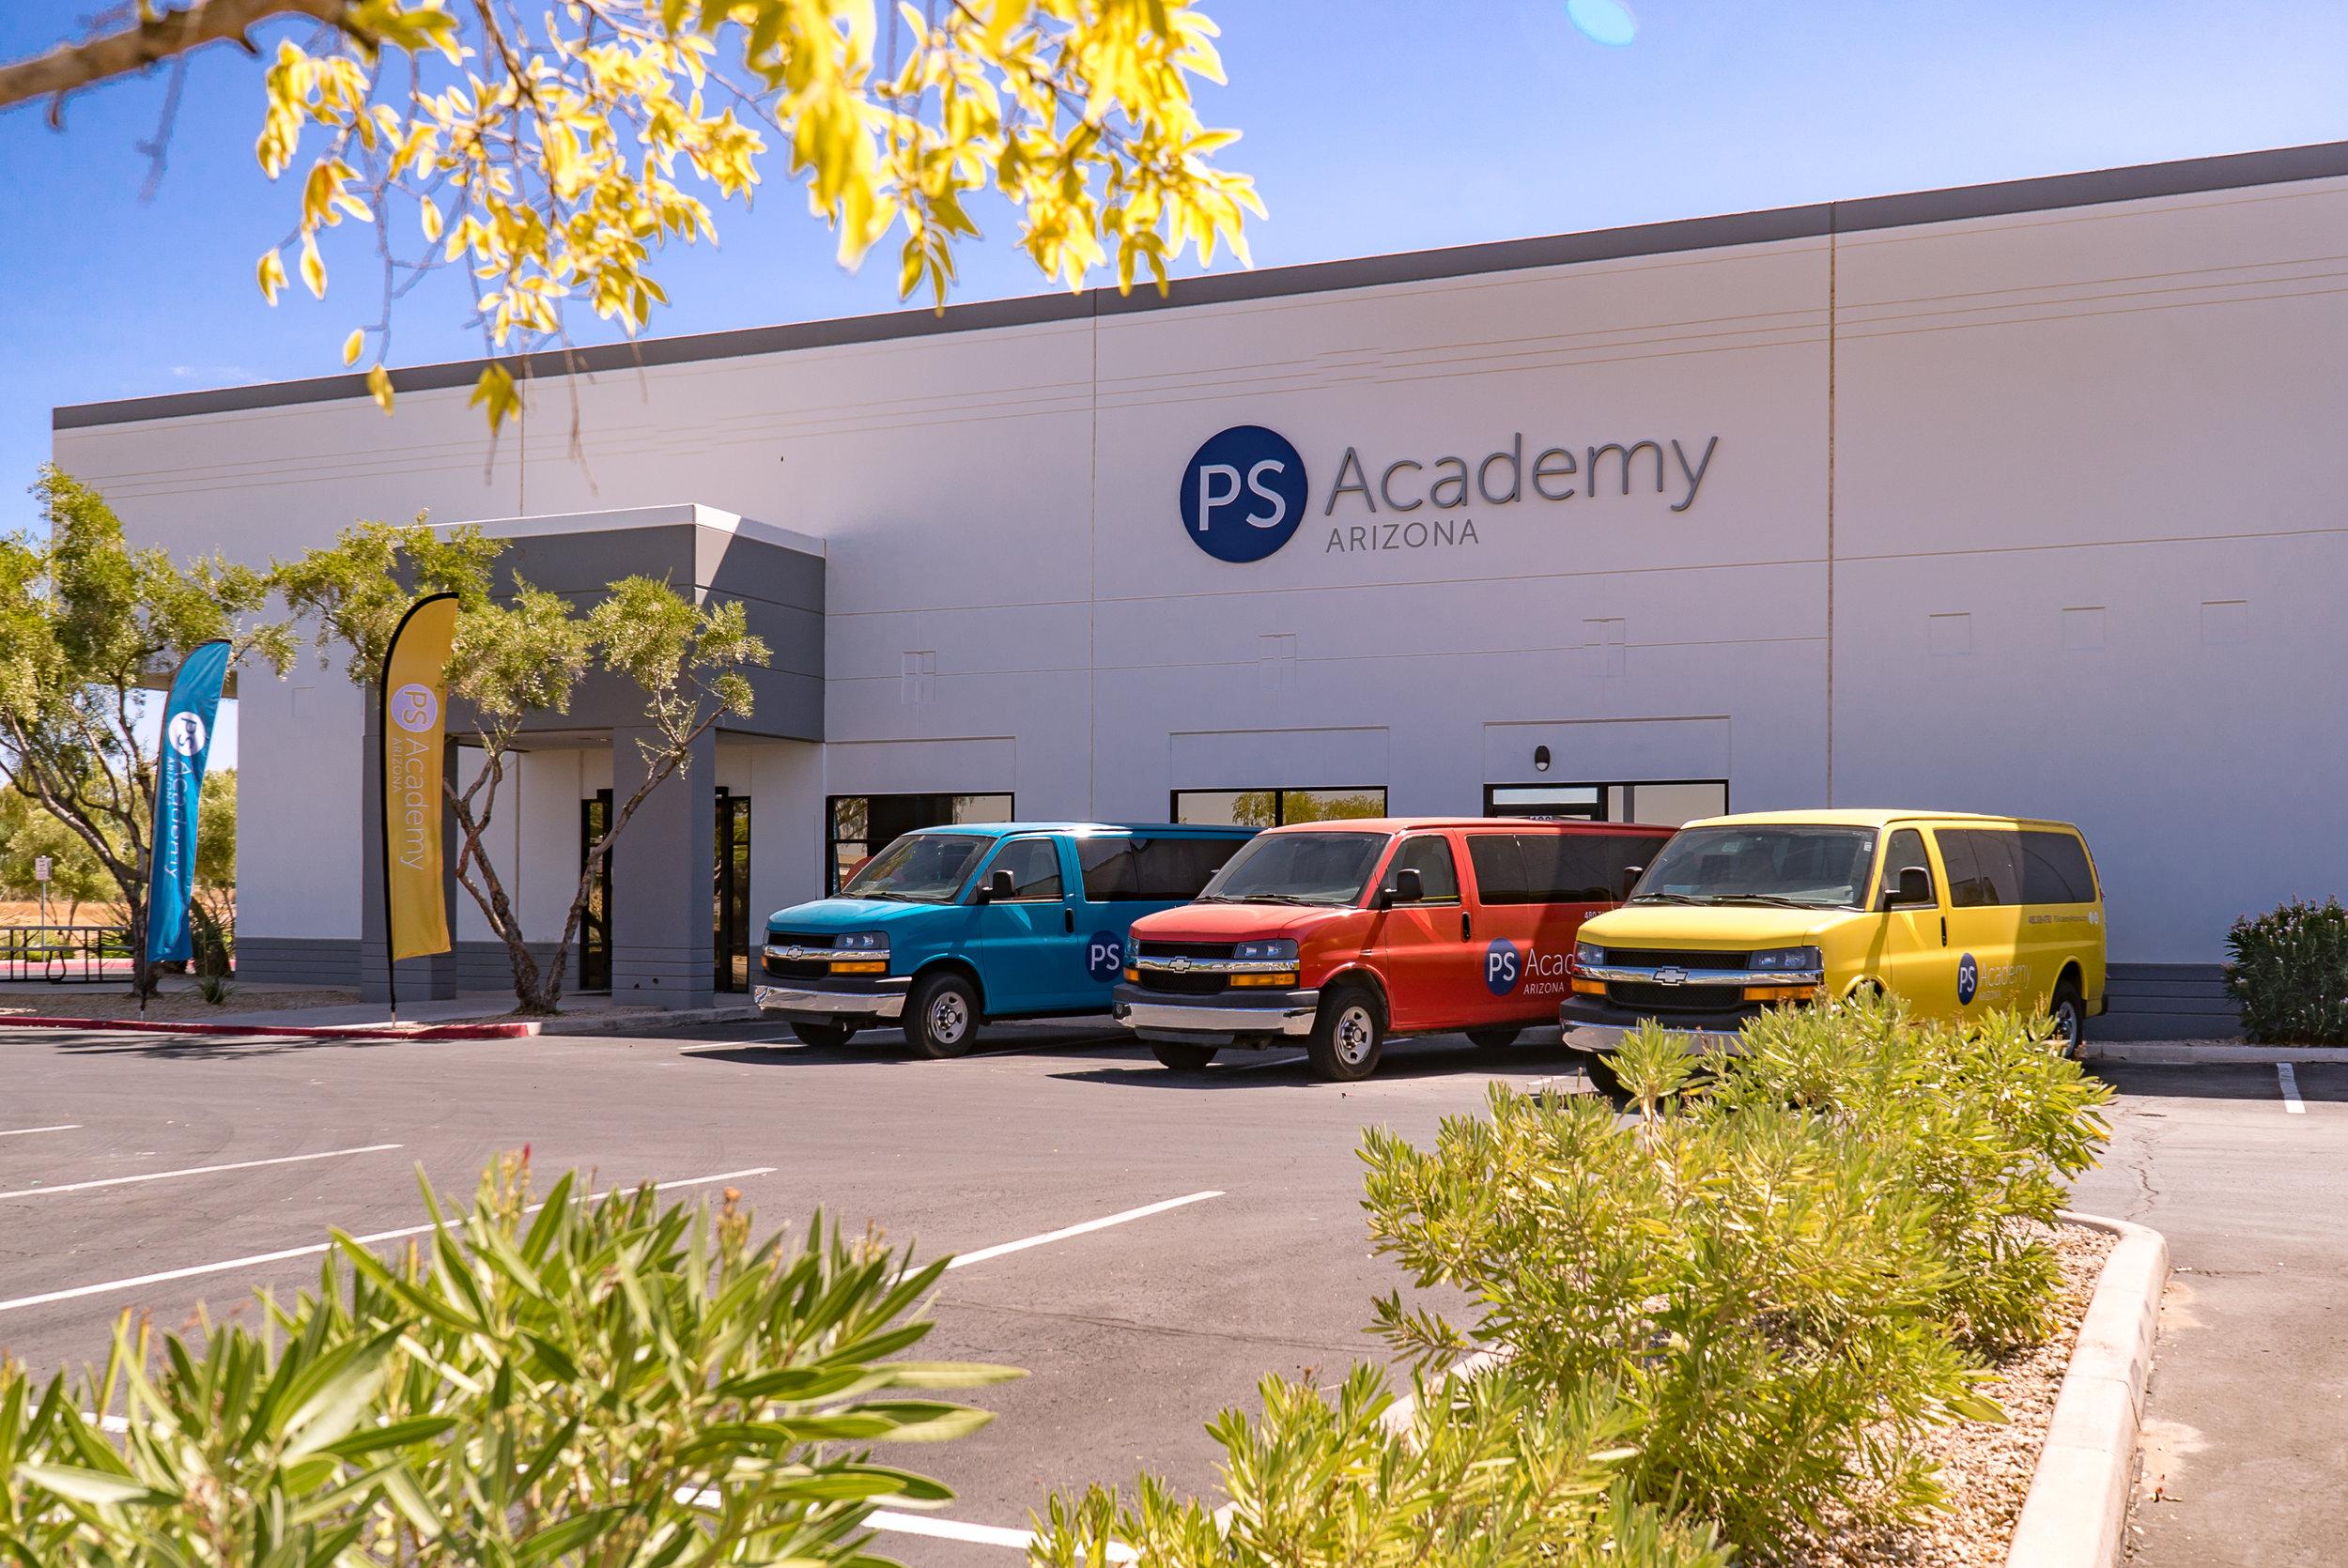 ps-academy-new-campus.jpg